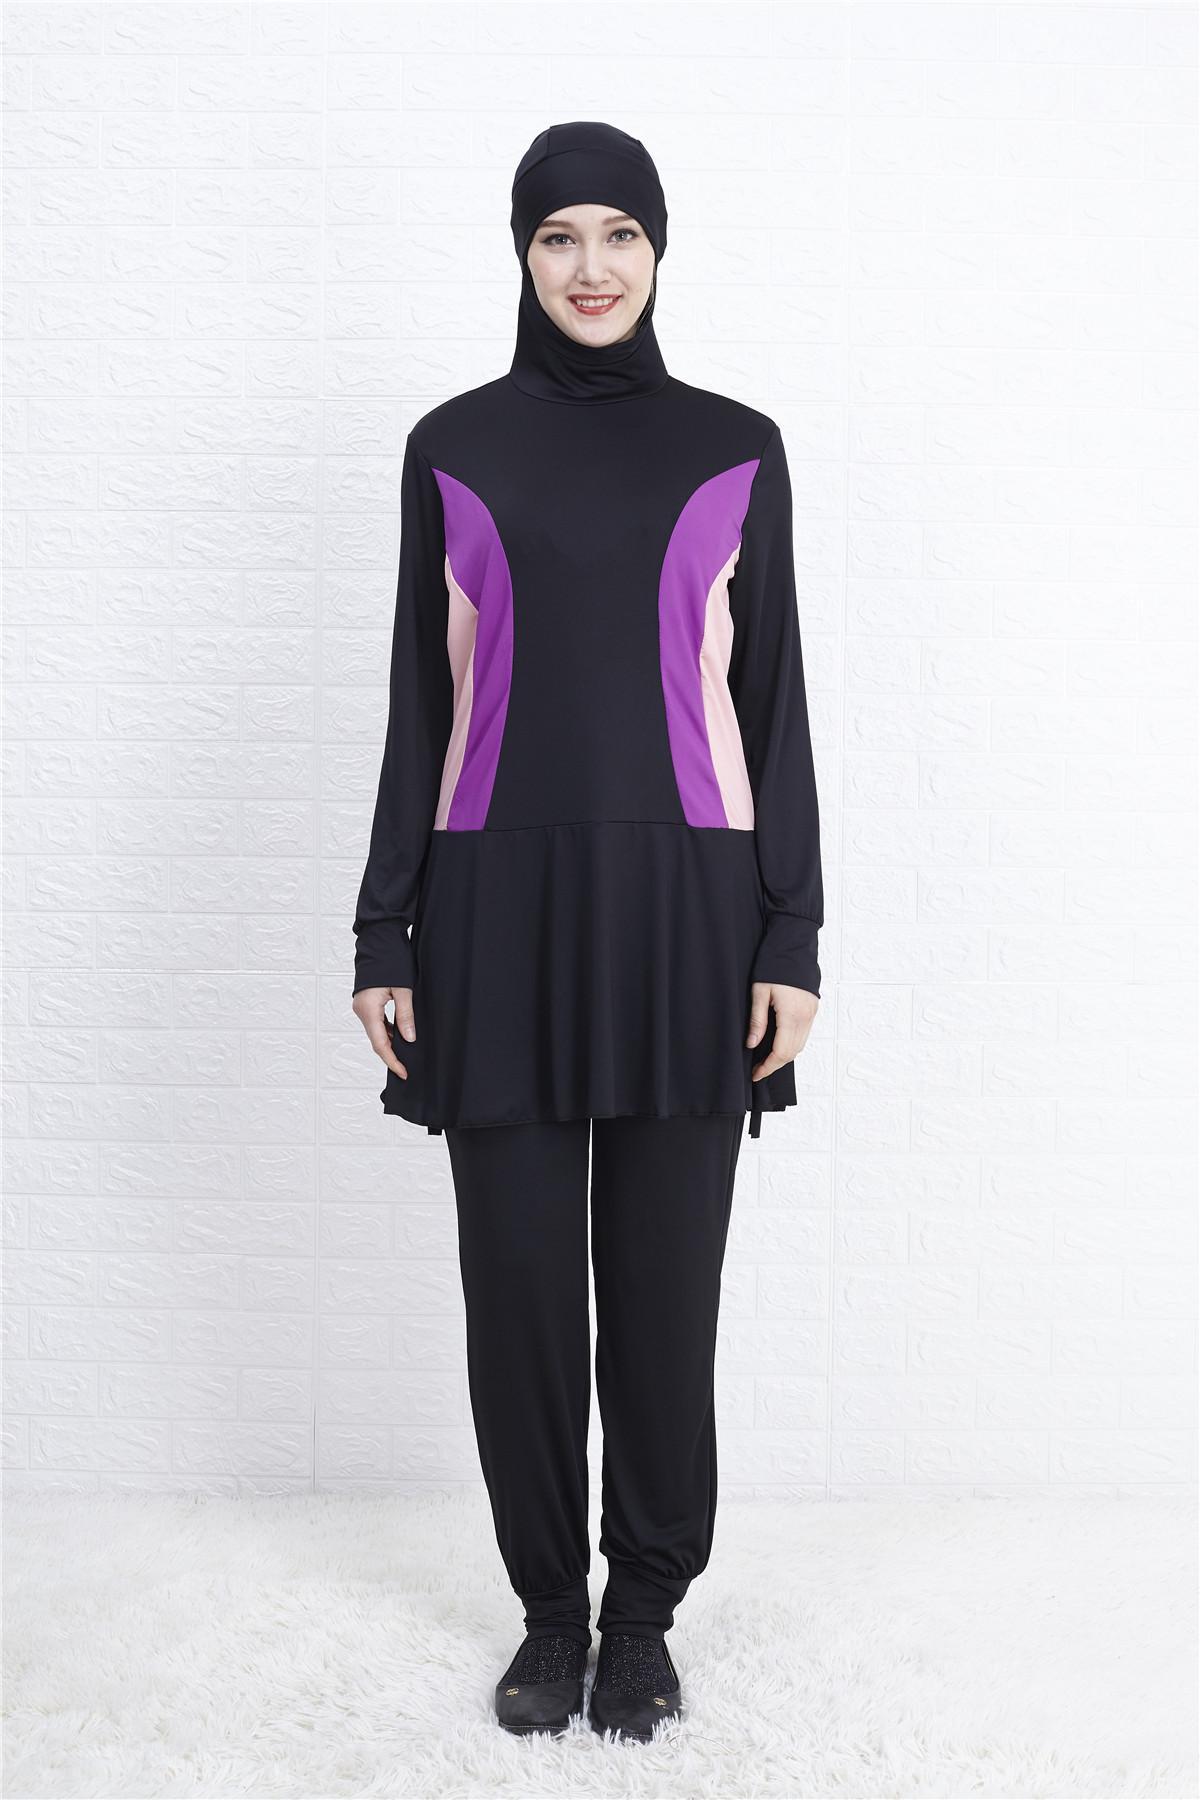 New Women Islamic Swimwear Muslim Swimsuit Burkini Modesty Full Cover Beachwear